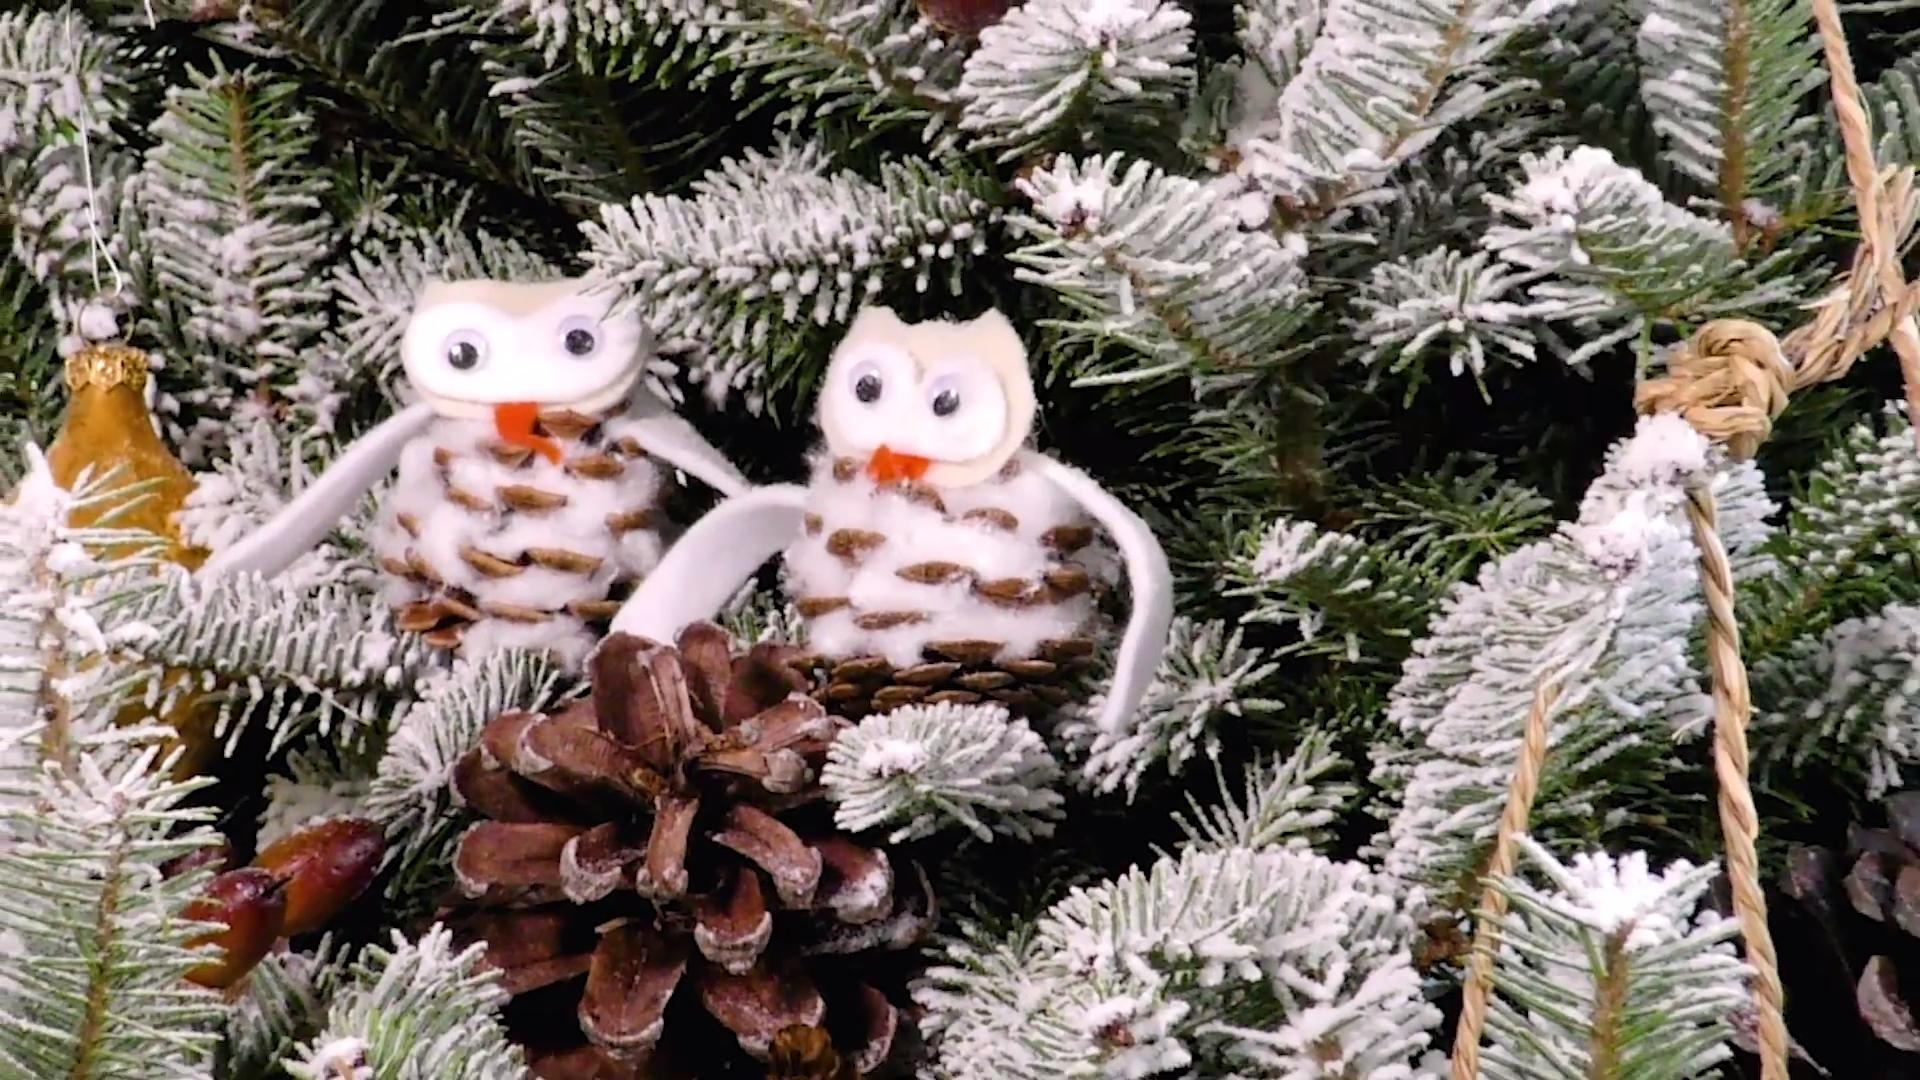 WATCH: 6 Easy Winter Craft Ideas